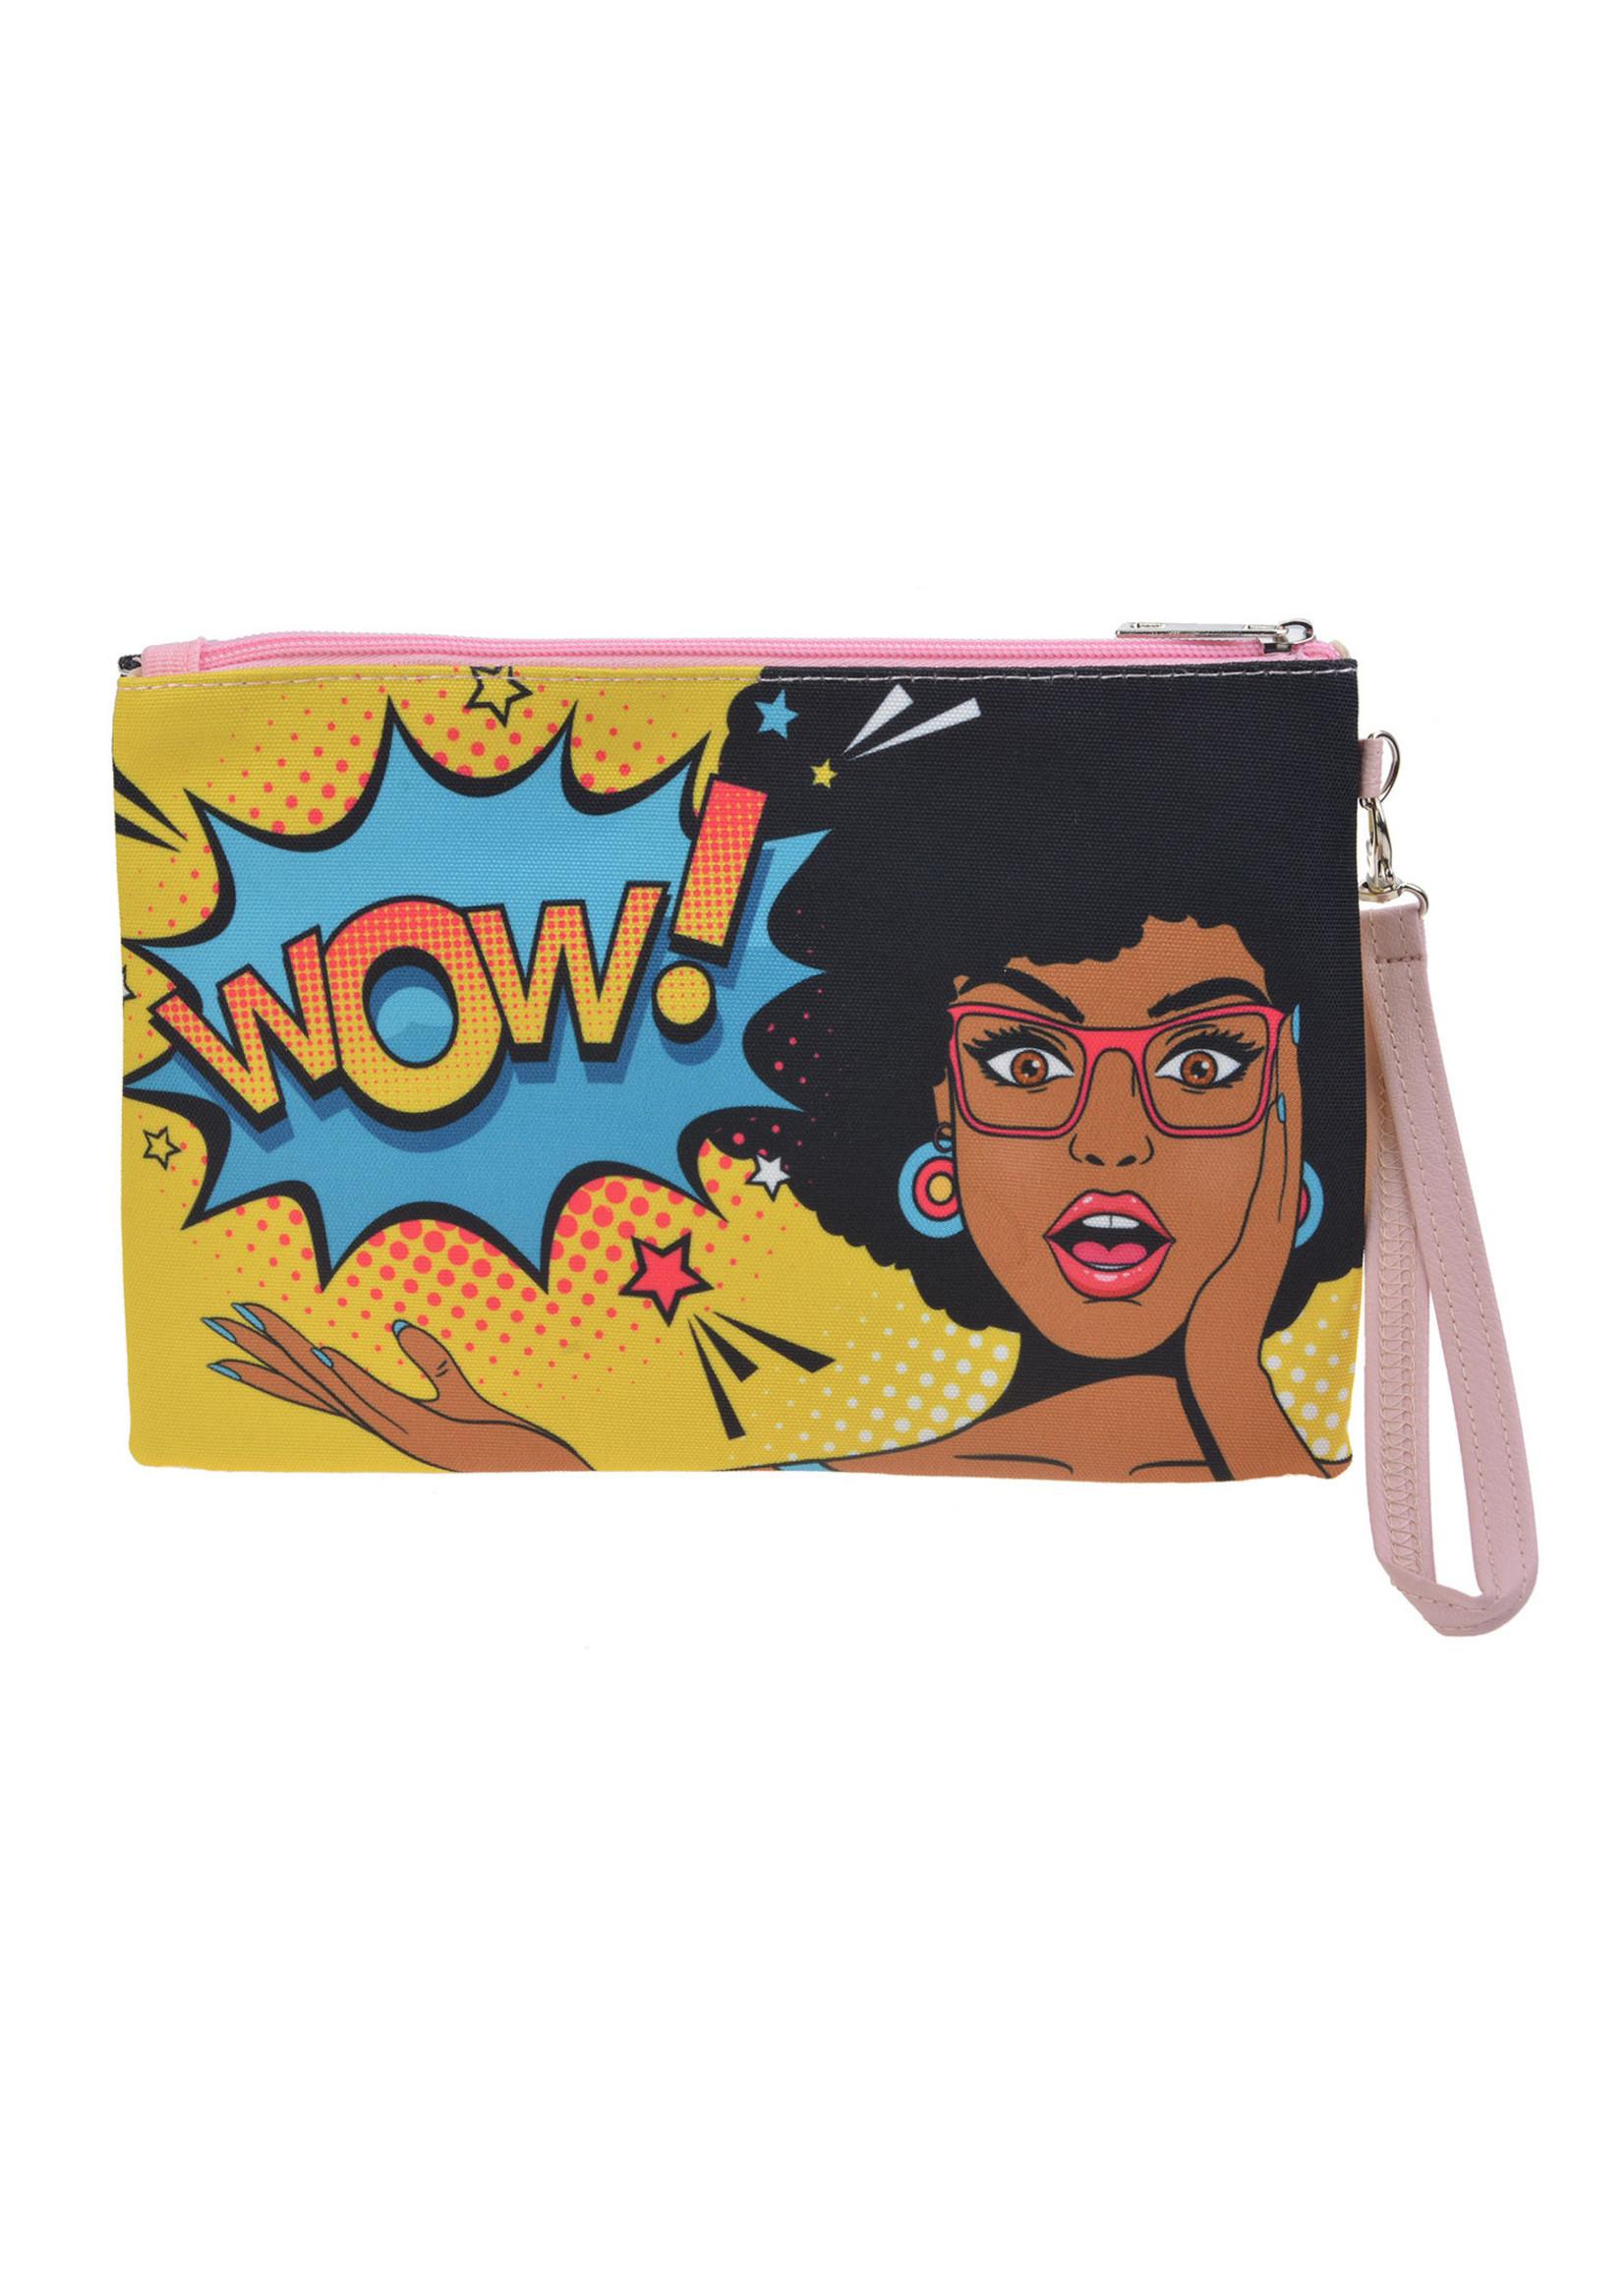 Make-Up bag in Pop-Art Style